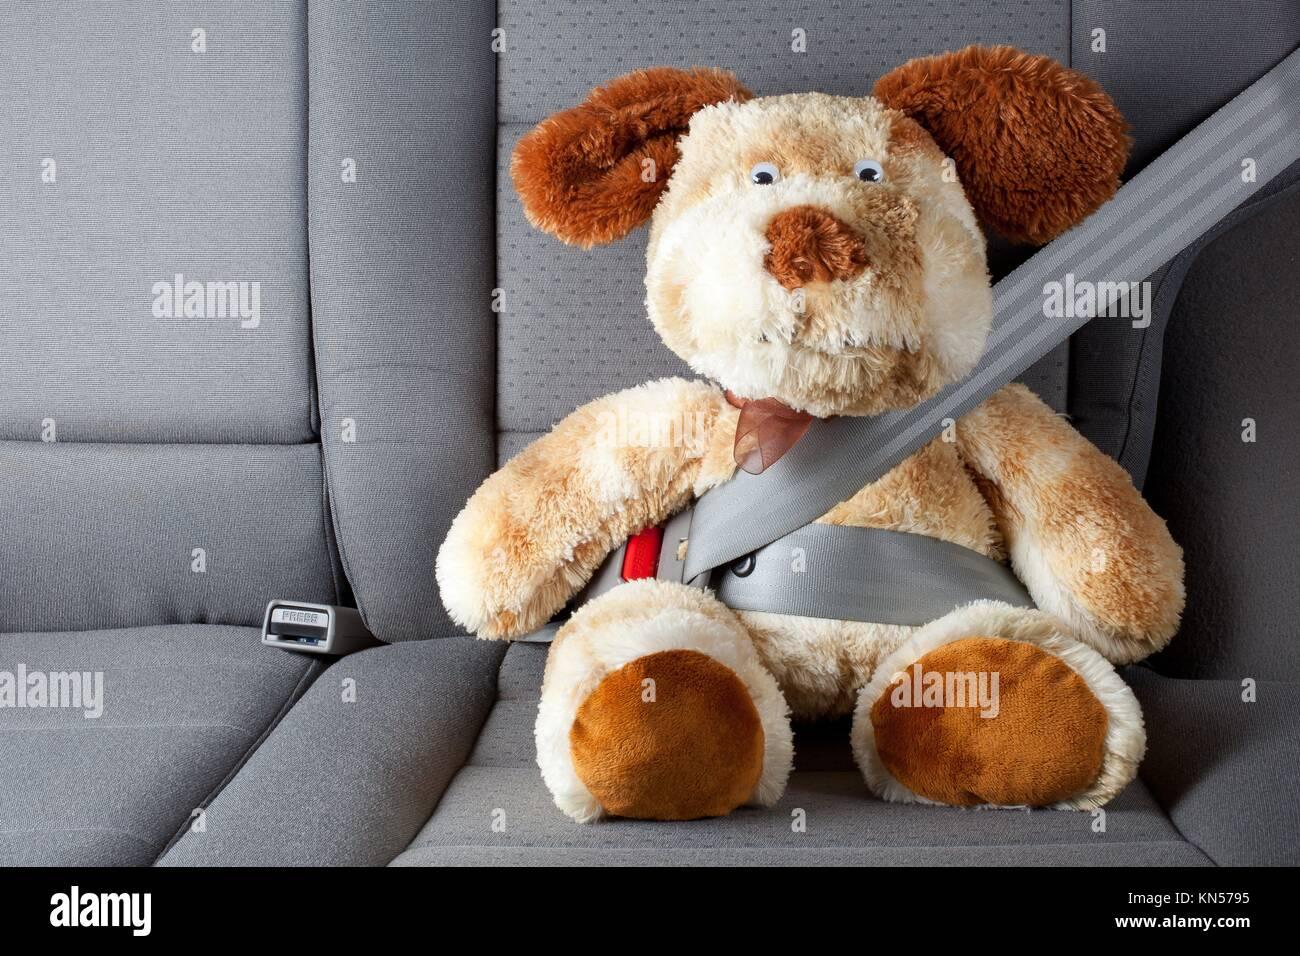 Stuffed Toy Wiith Seat Belt Fastened Stock Photo 167916593 Alamy